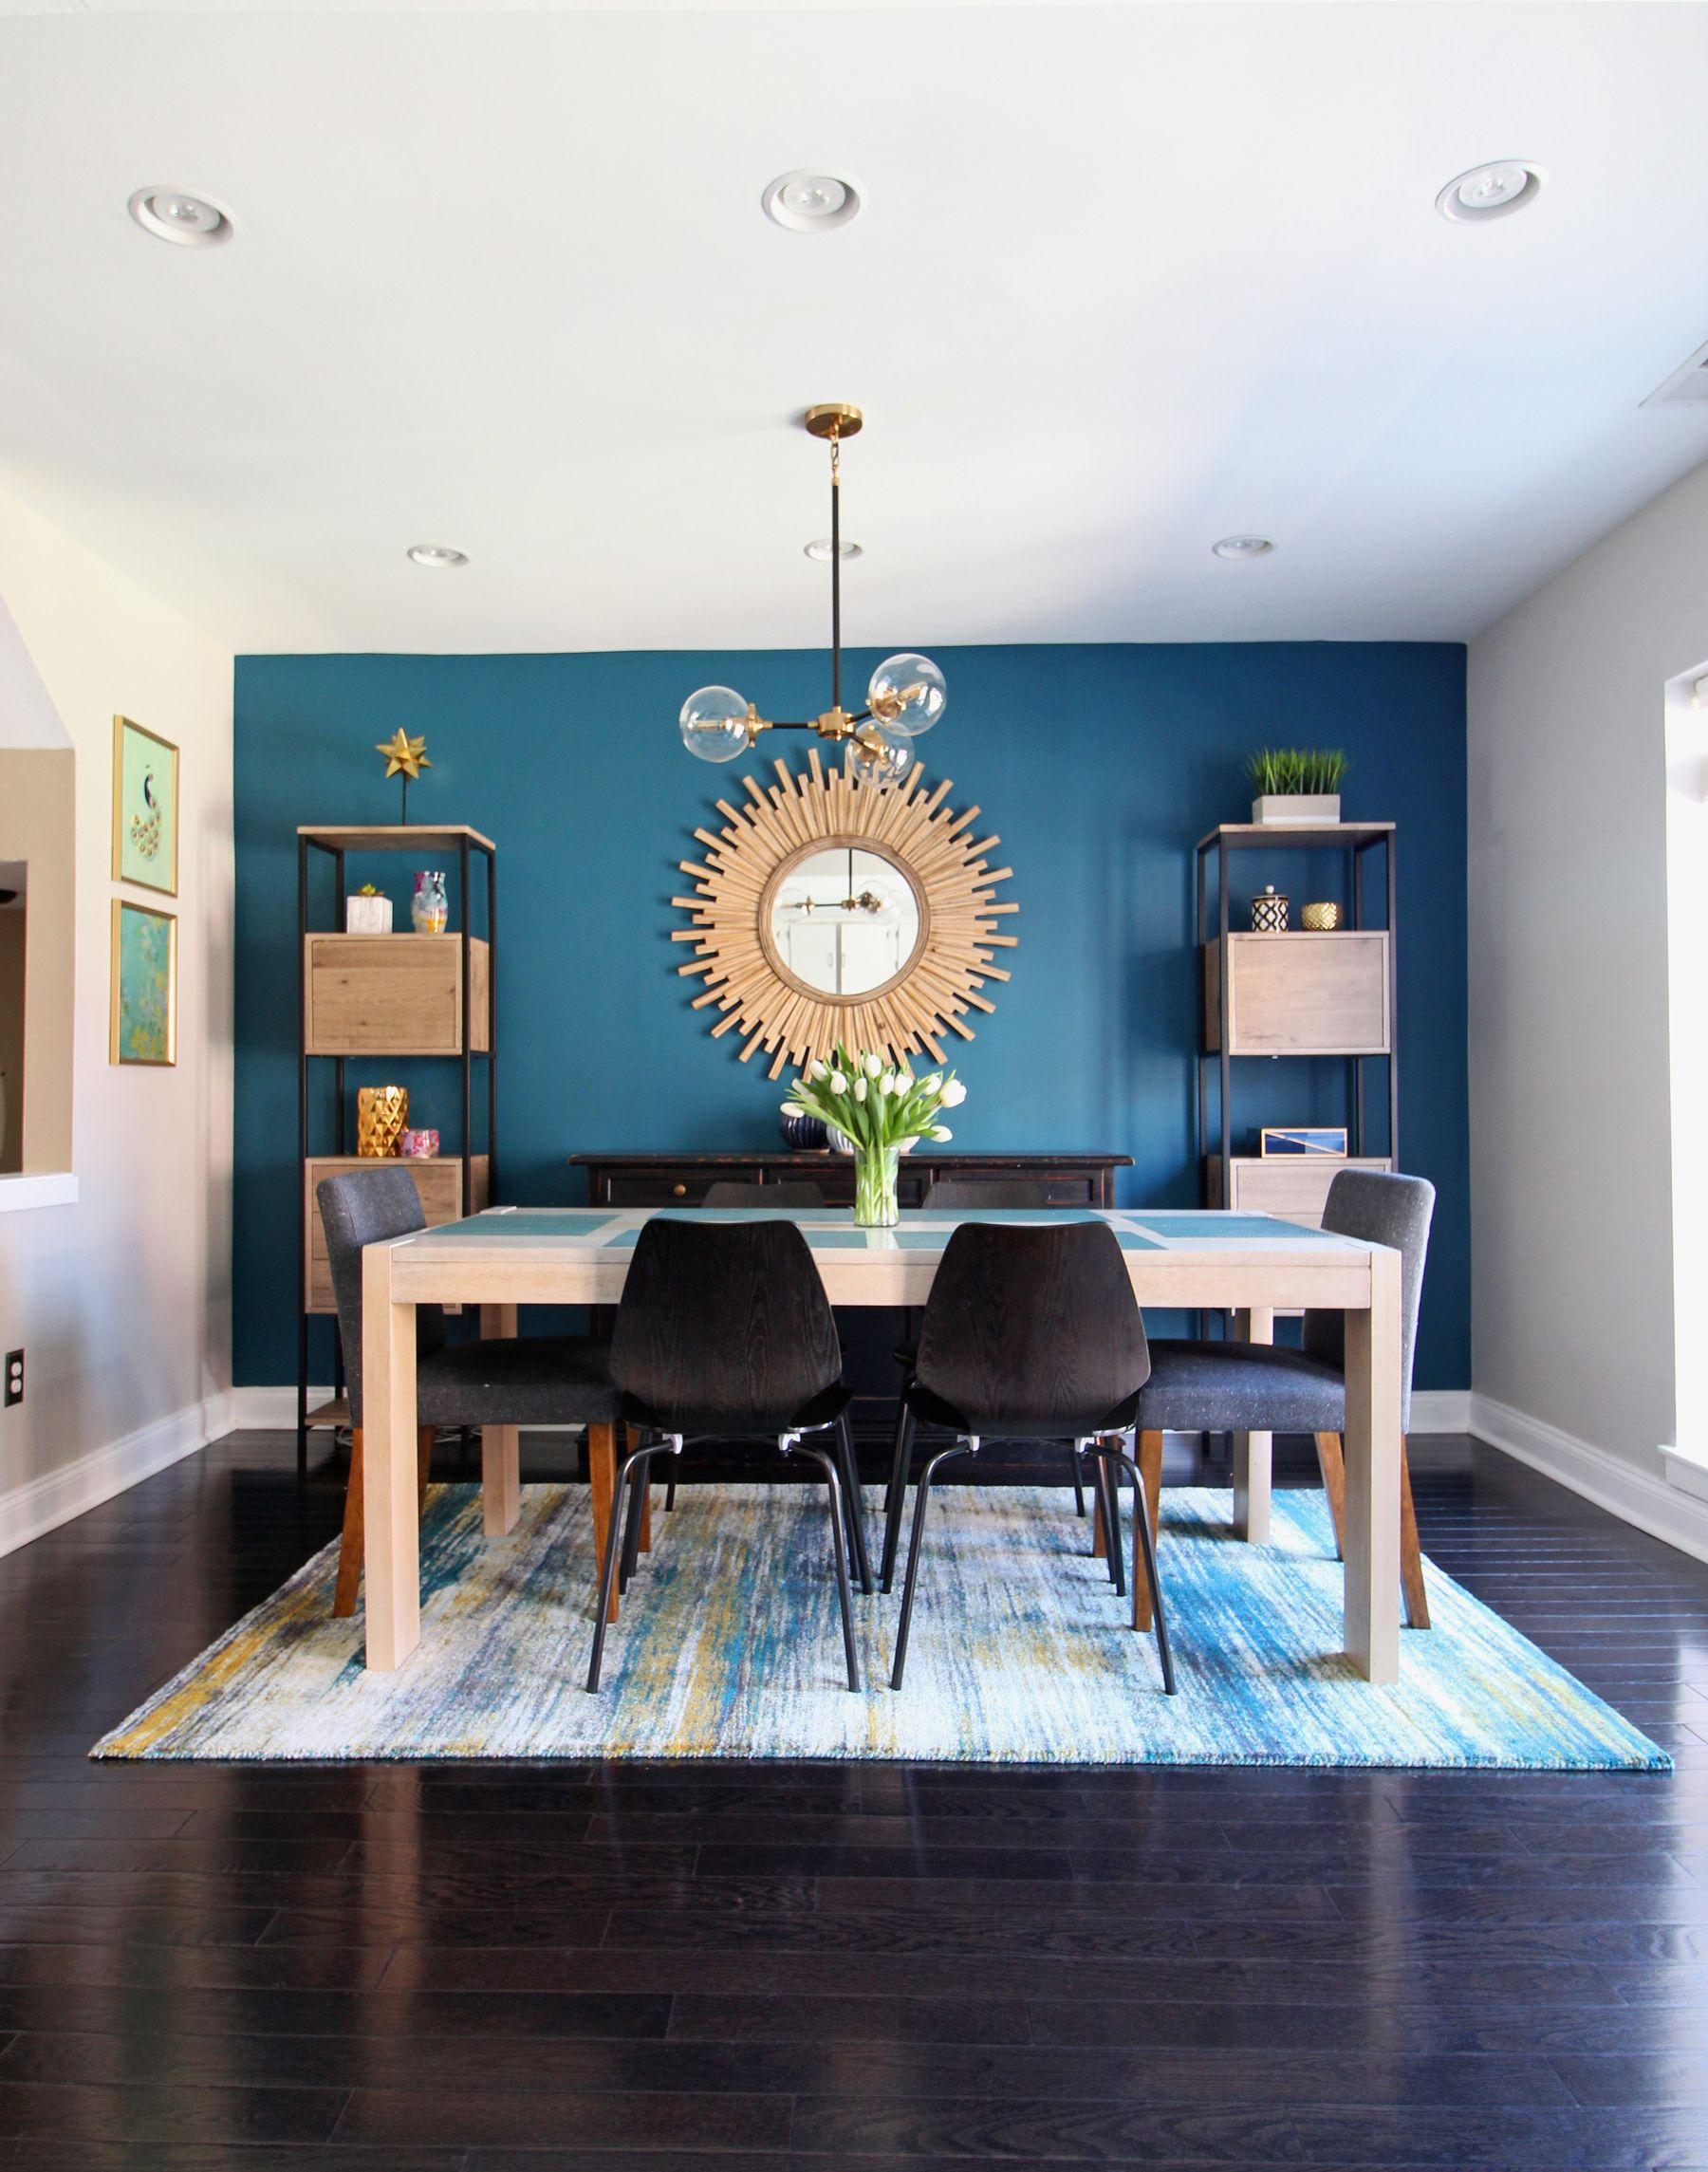 Queen Village Cozy Modern Dining Room Reveal Blue Walls Living